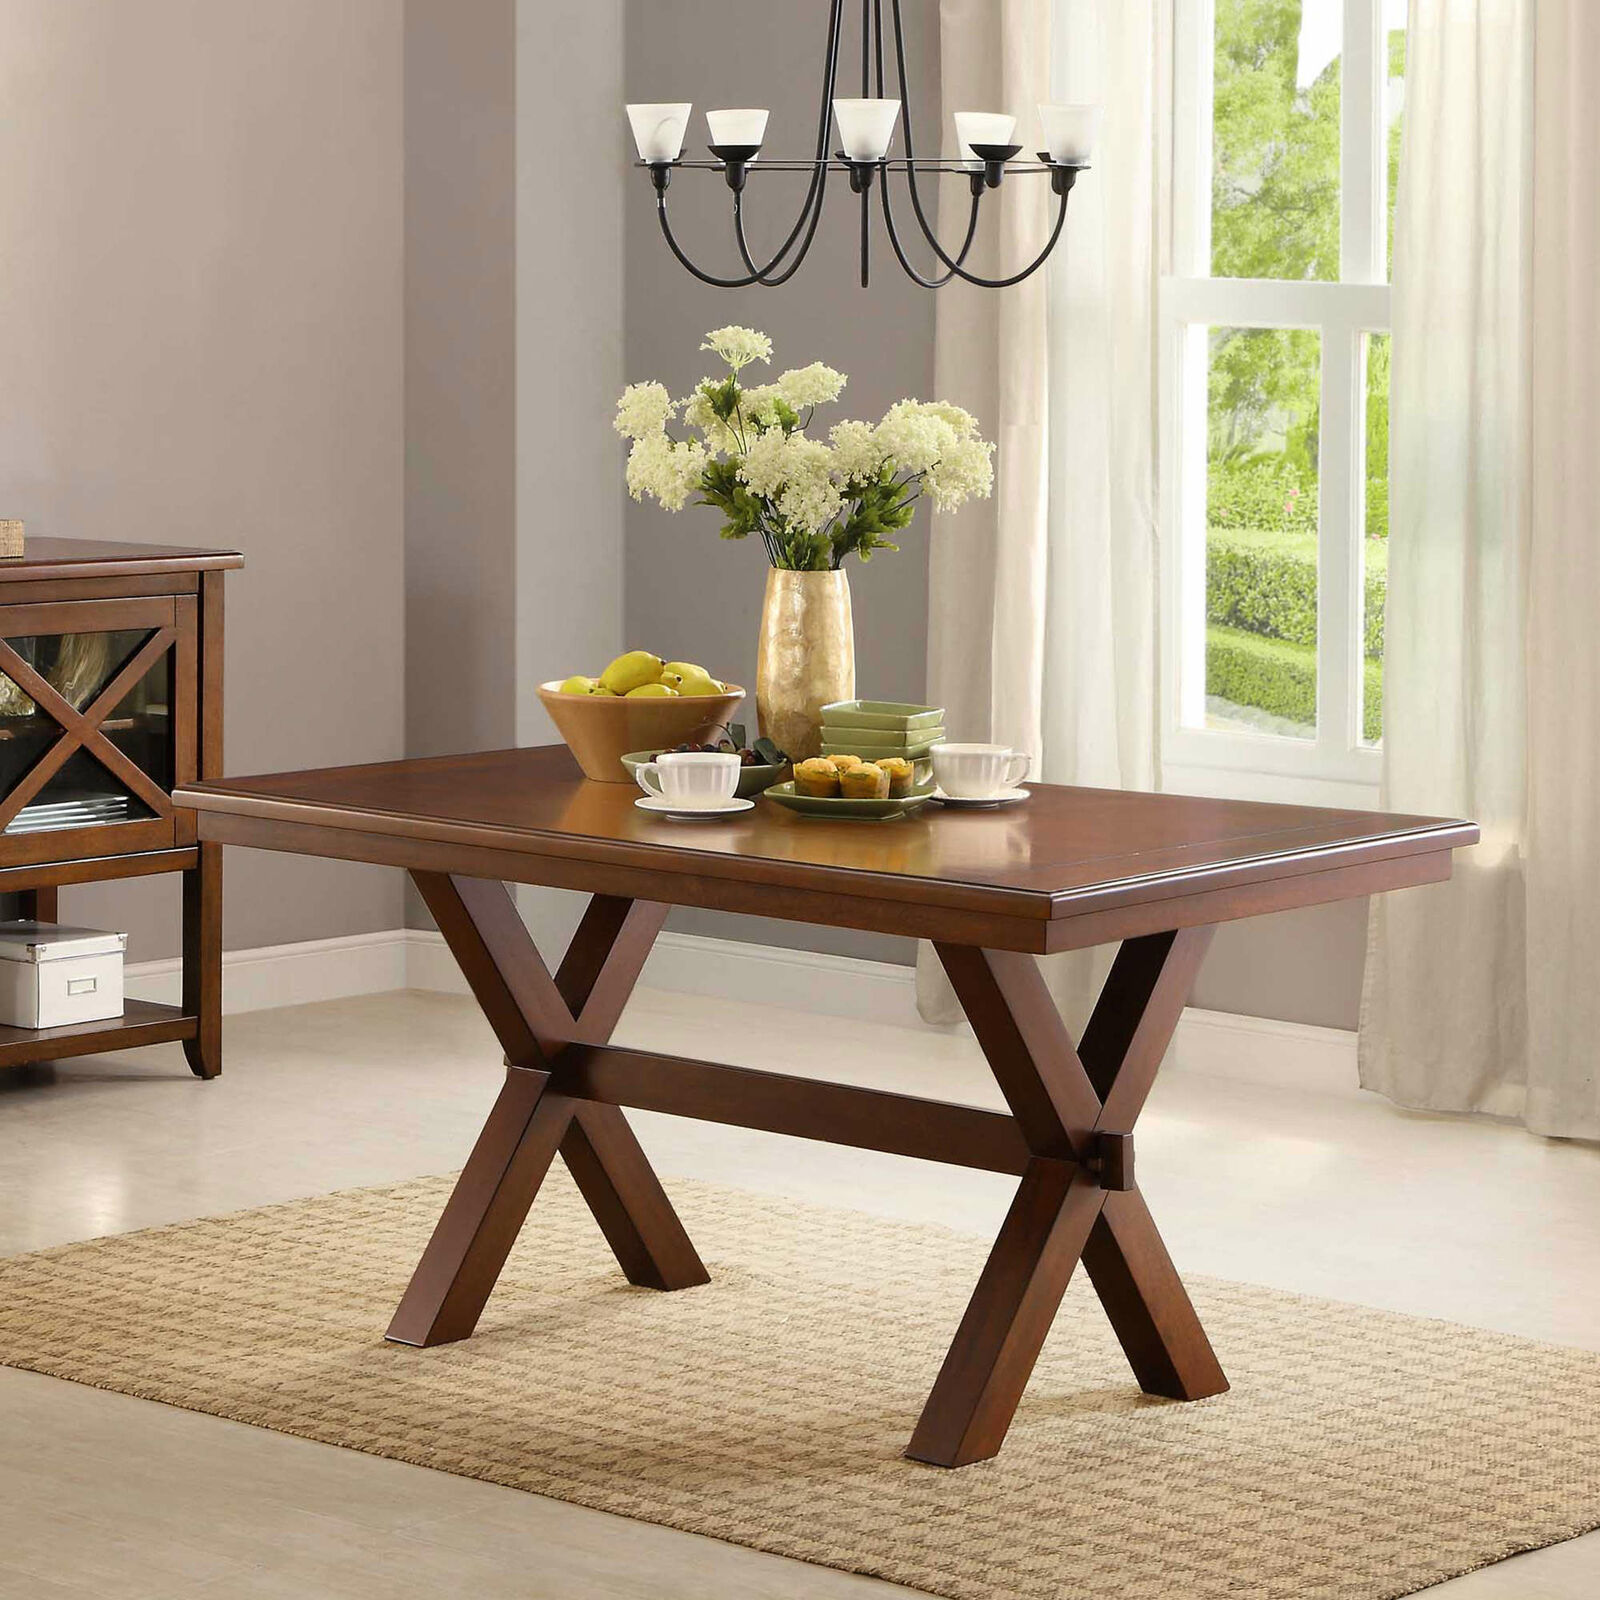 meja makan kayu dekorasi ruang makan dan meja dapur mini tanpa kursi